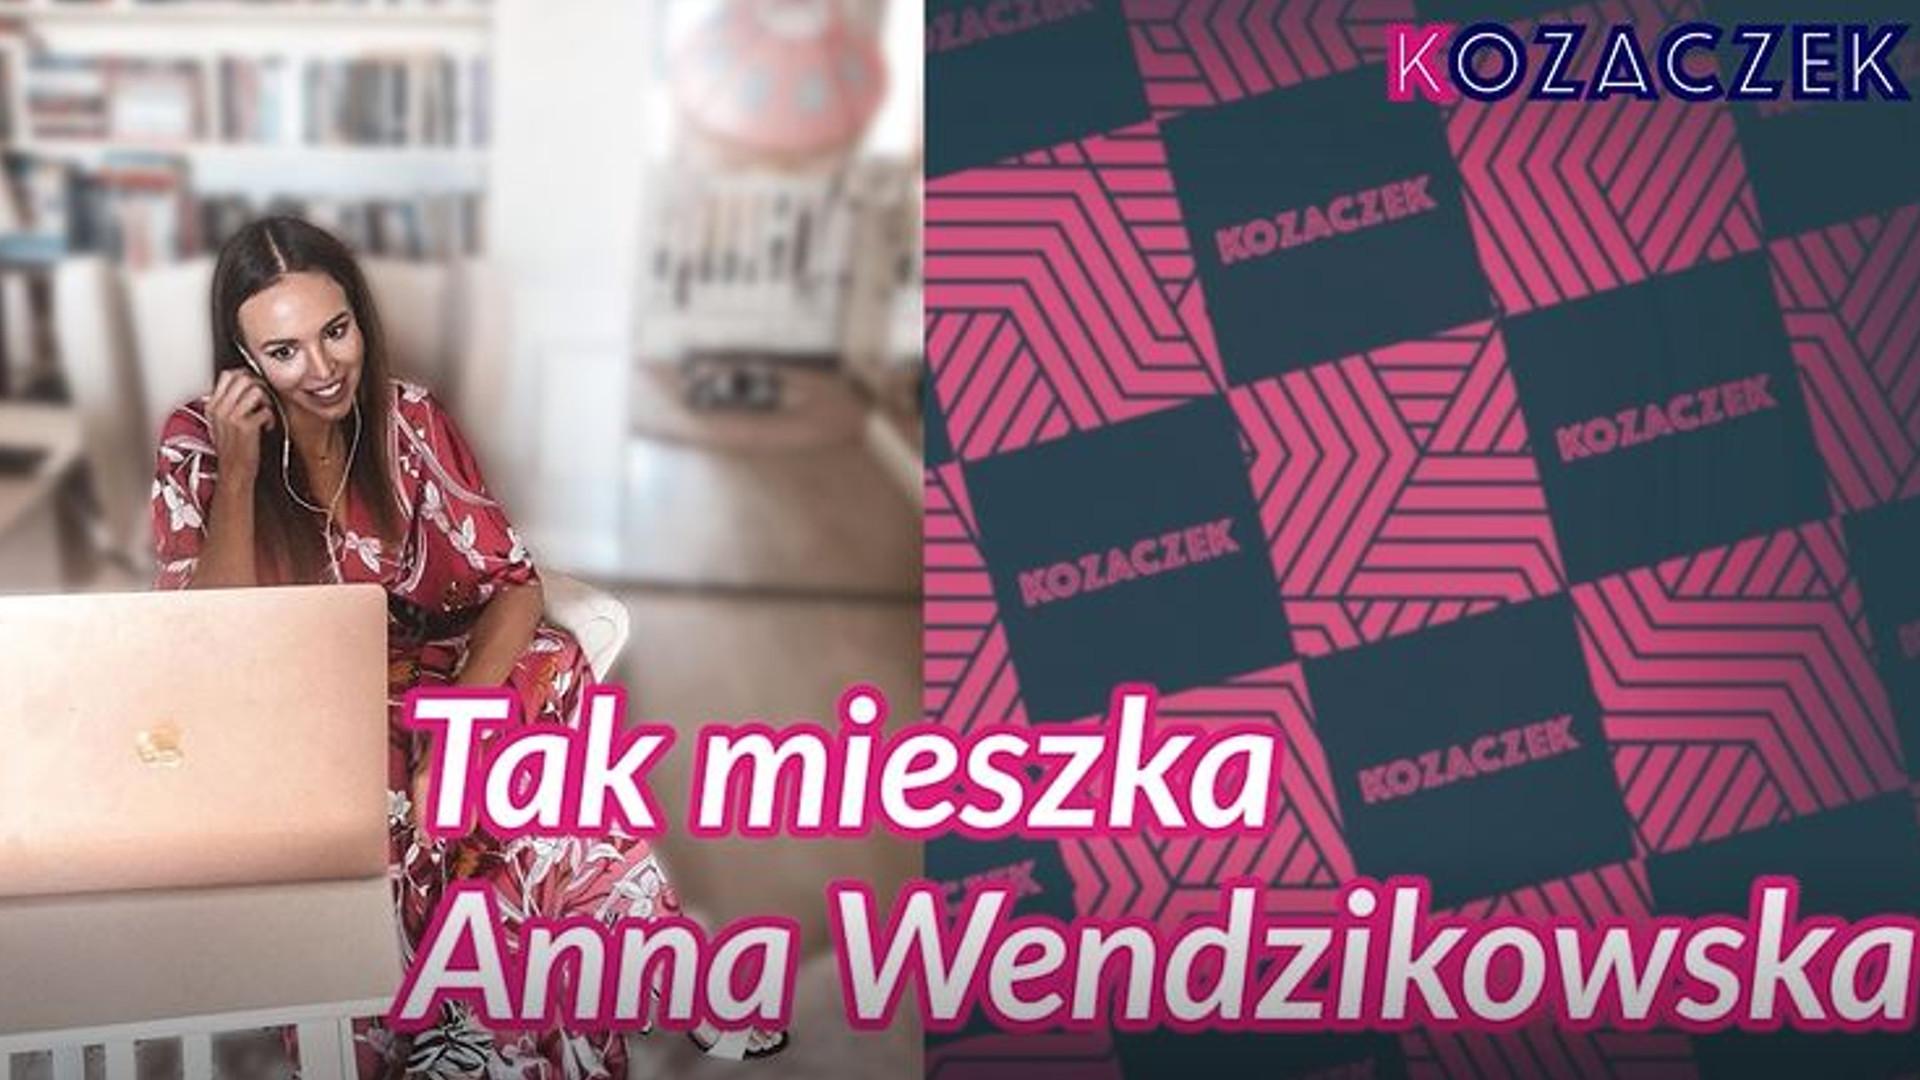 Jak mieszka Anna Wendzikowska?